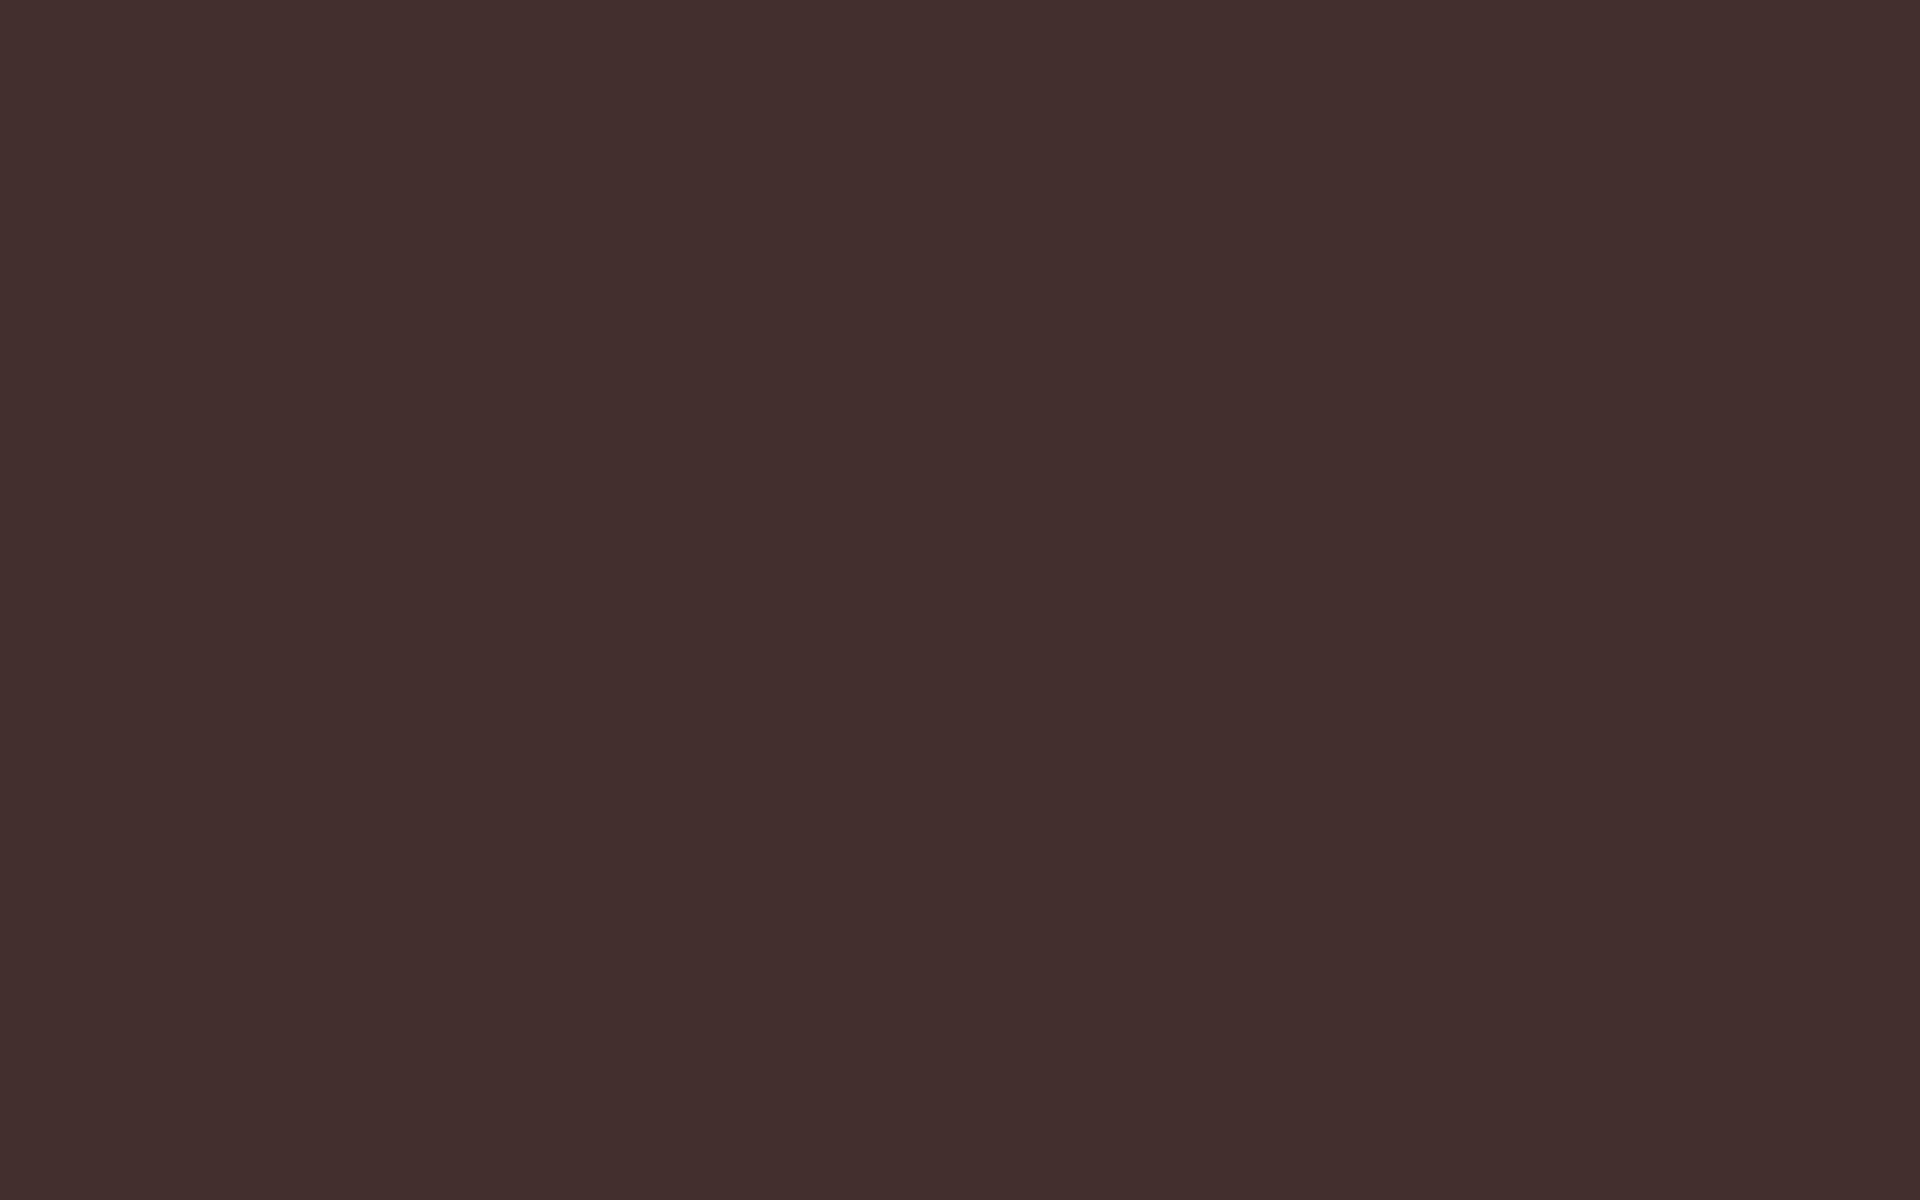 1920x1200 Old Burgundy Solid Color Background